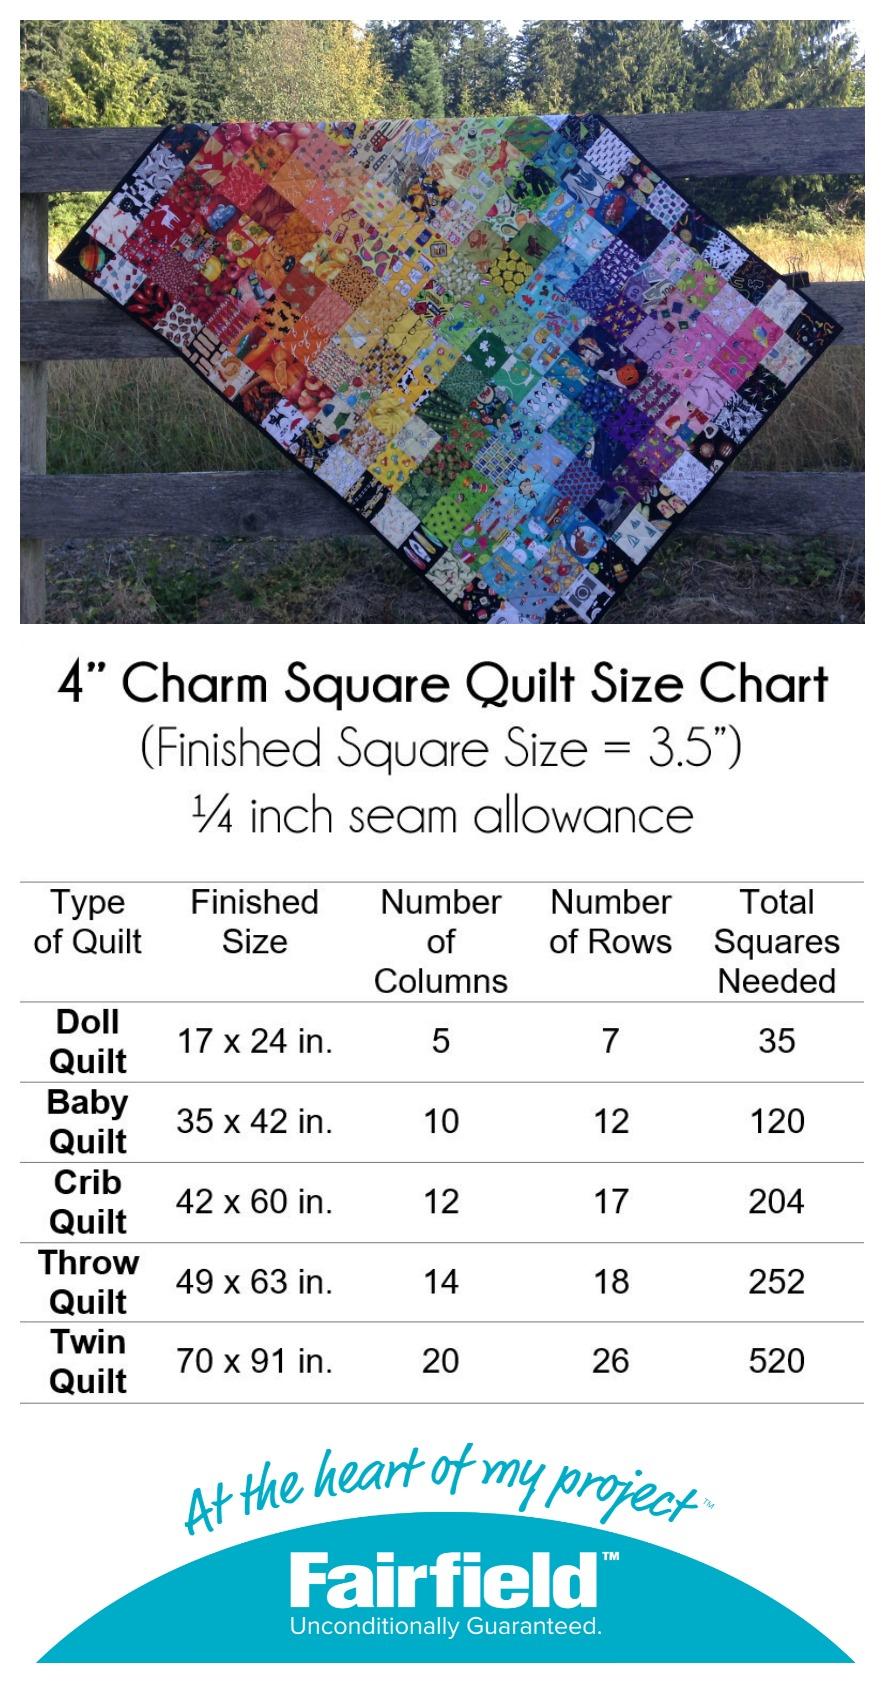 Rainbow Ombre Quilt - I-Spy Quilt - Fairfield World Craft